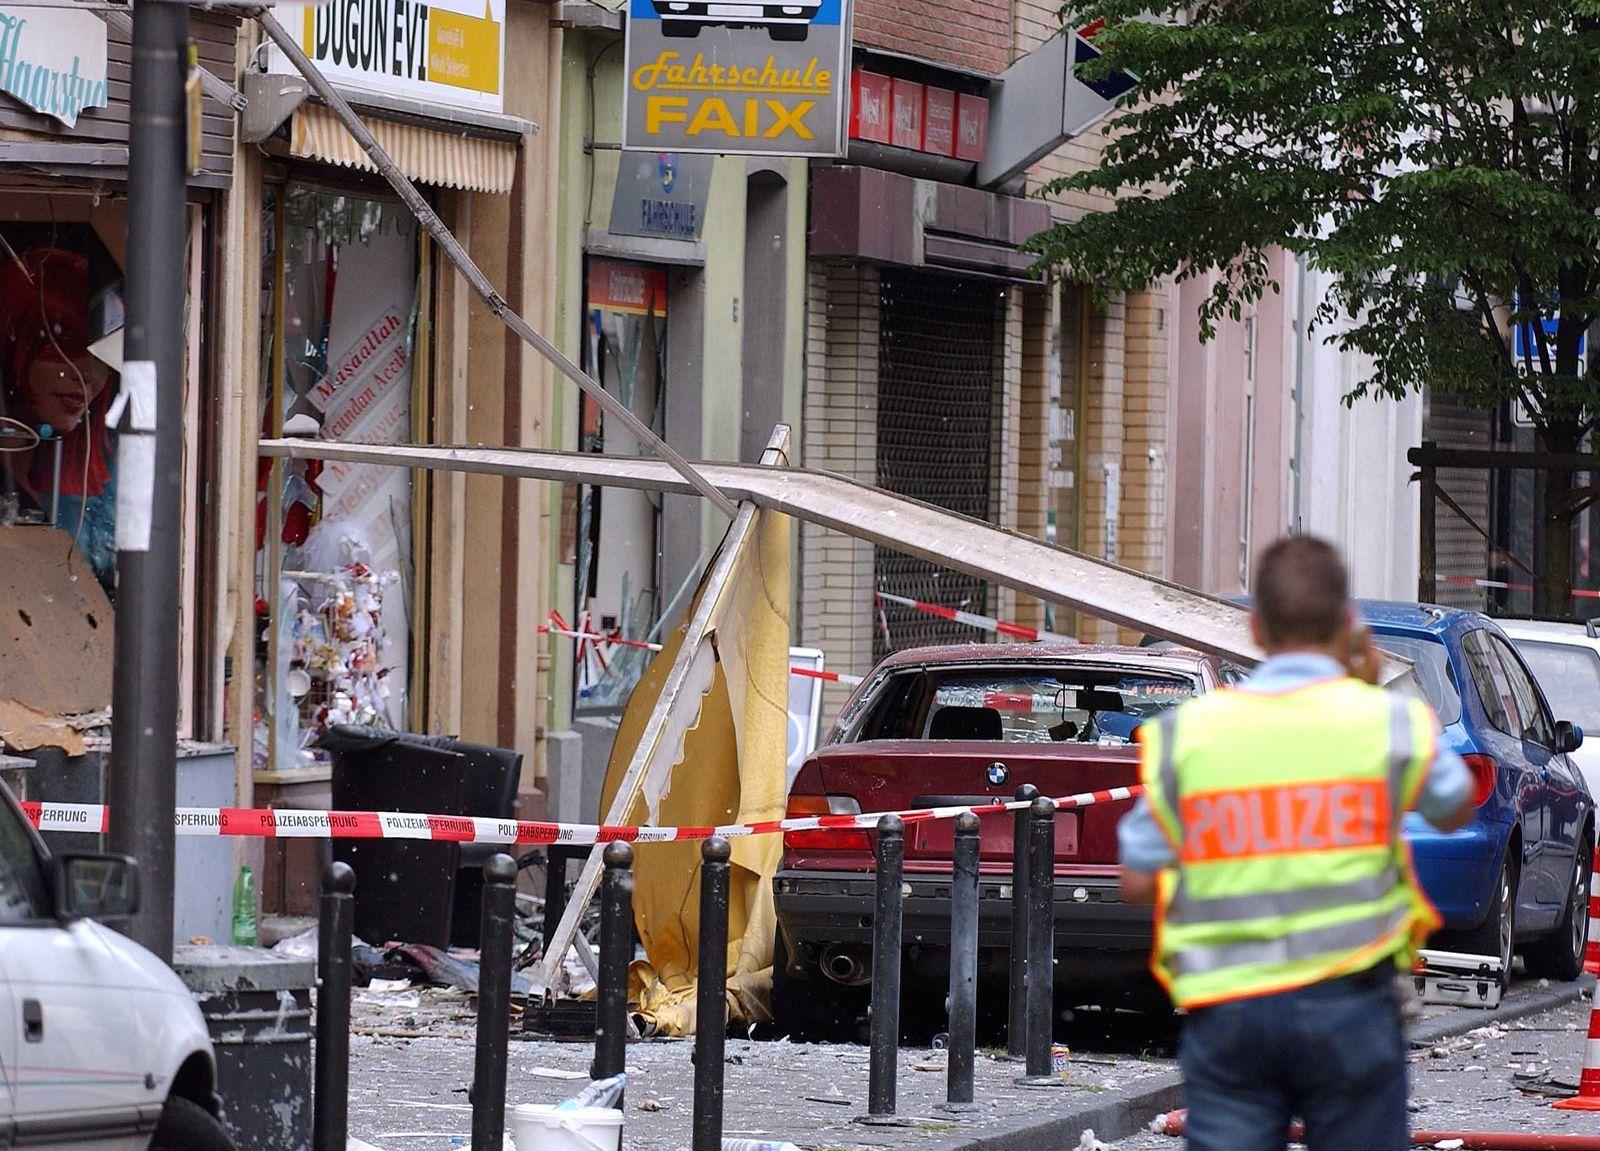 NSU/ Rechte Terrorzelle/ Keupstraße